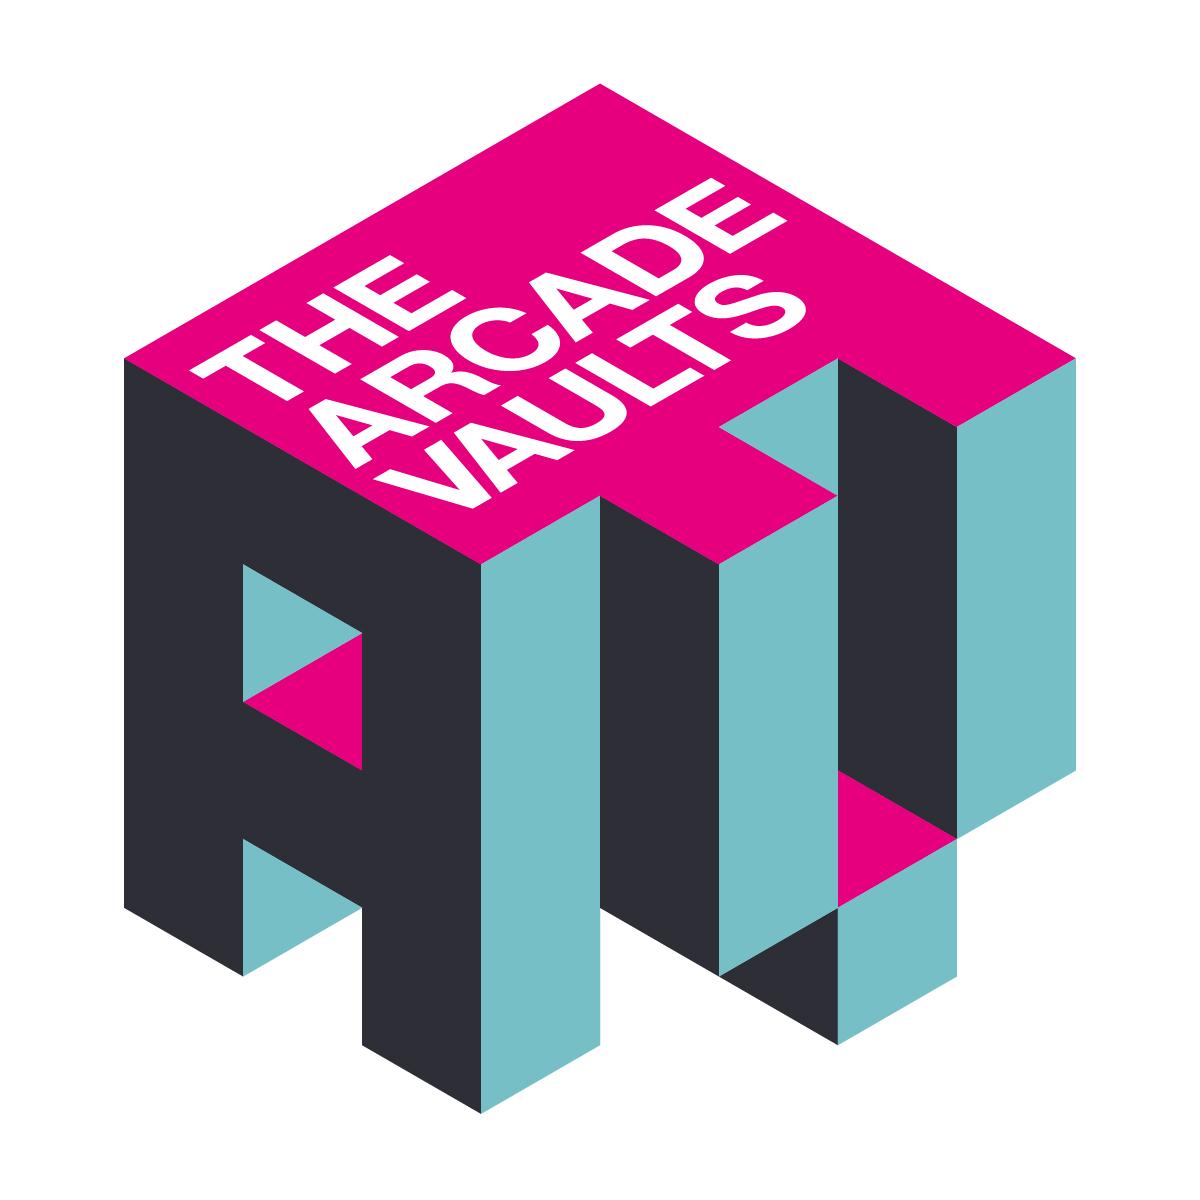 The Arcade Vaults logo